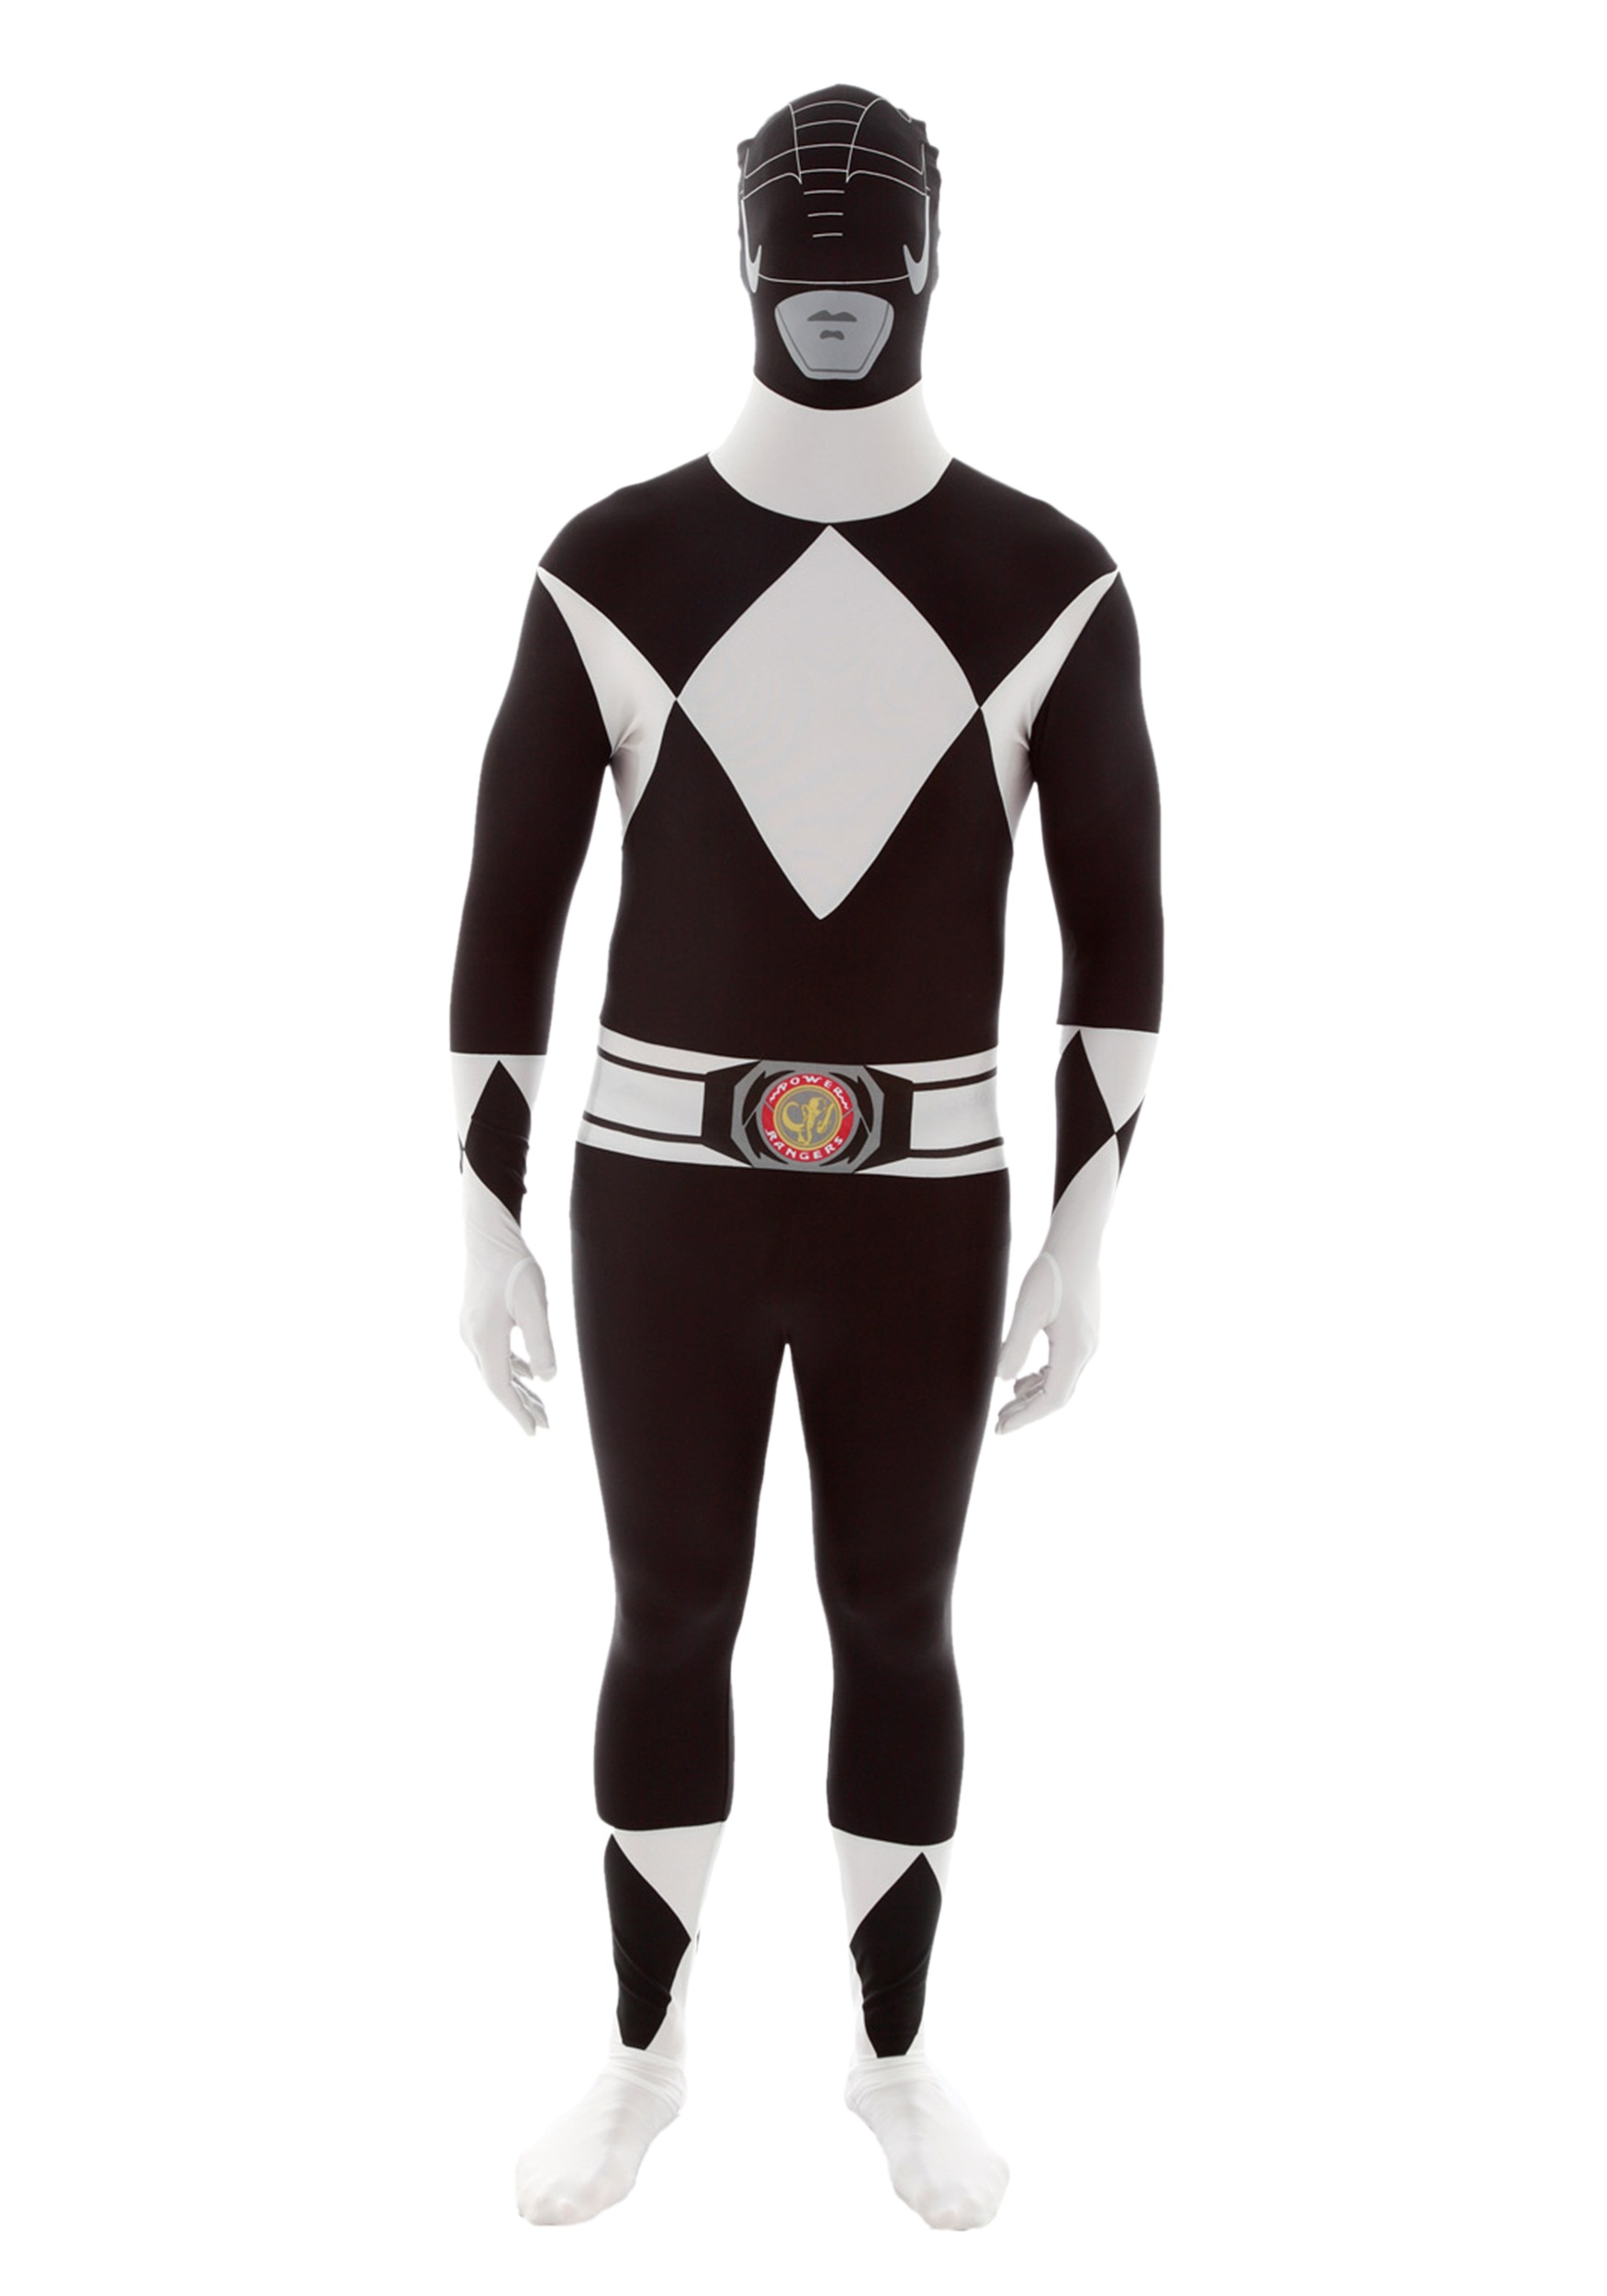 New Year Ranger Costume 5